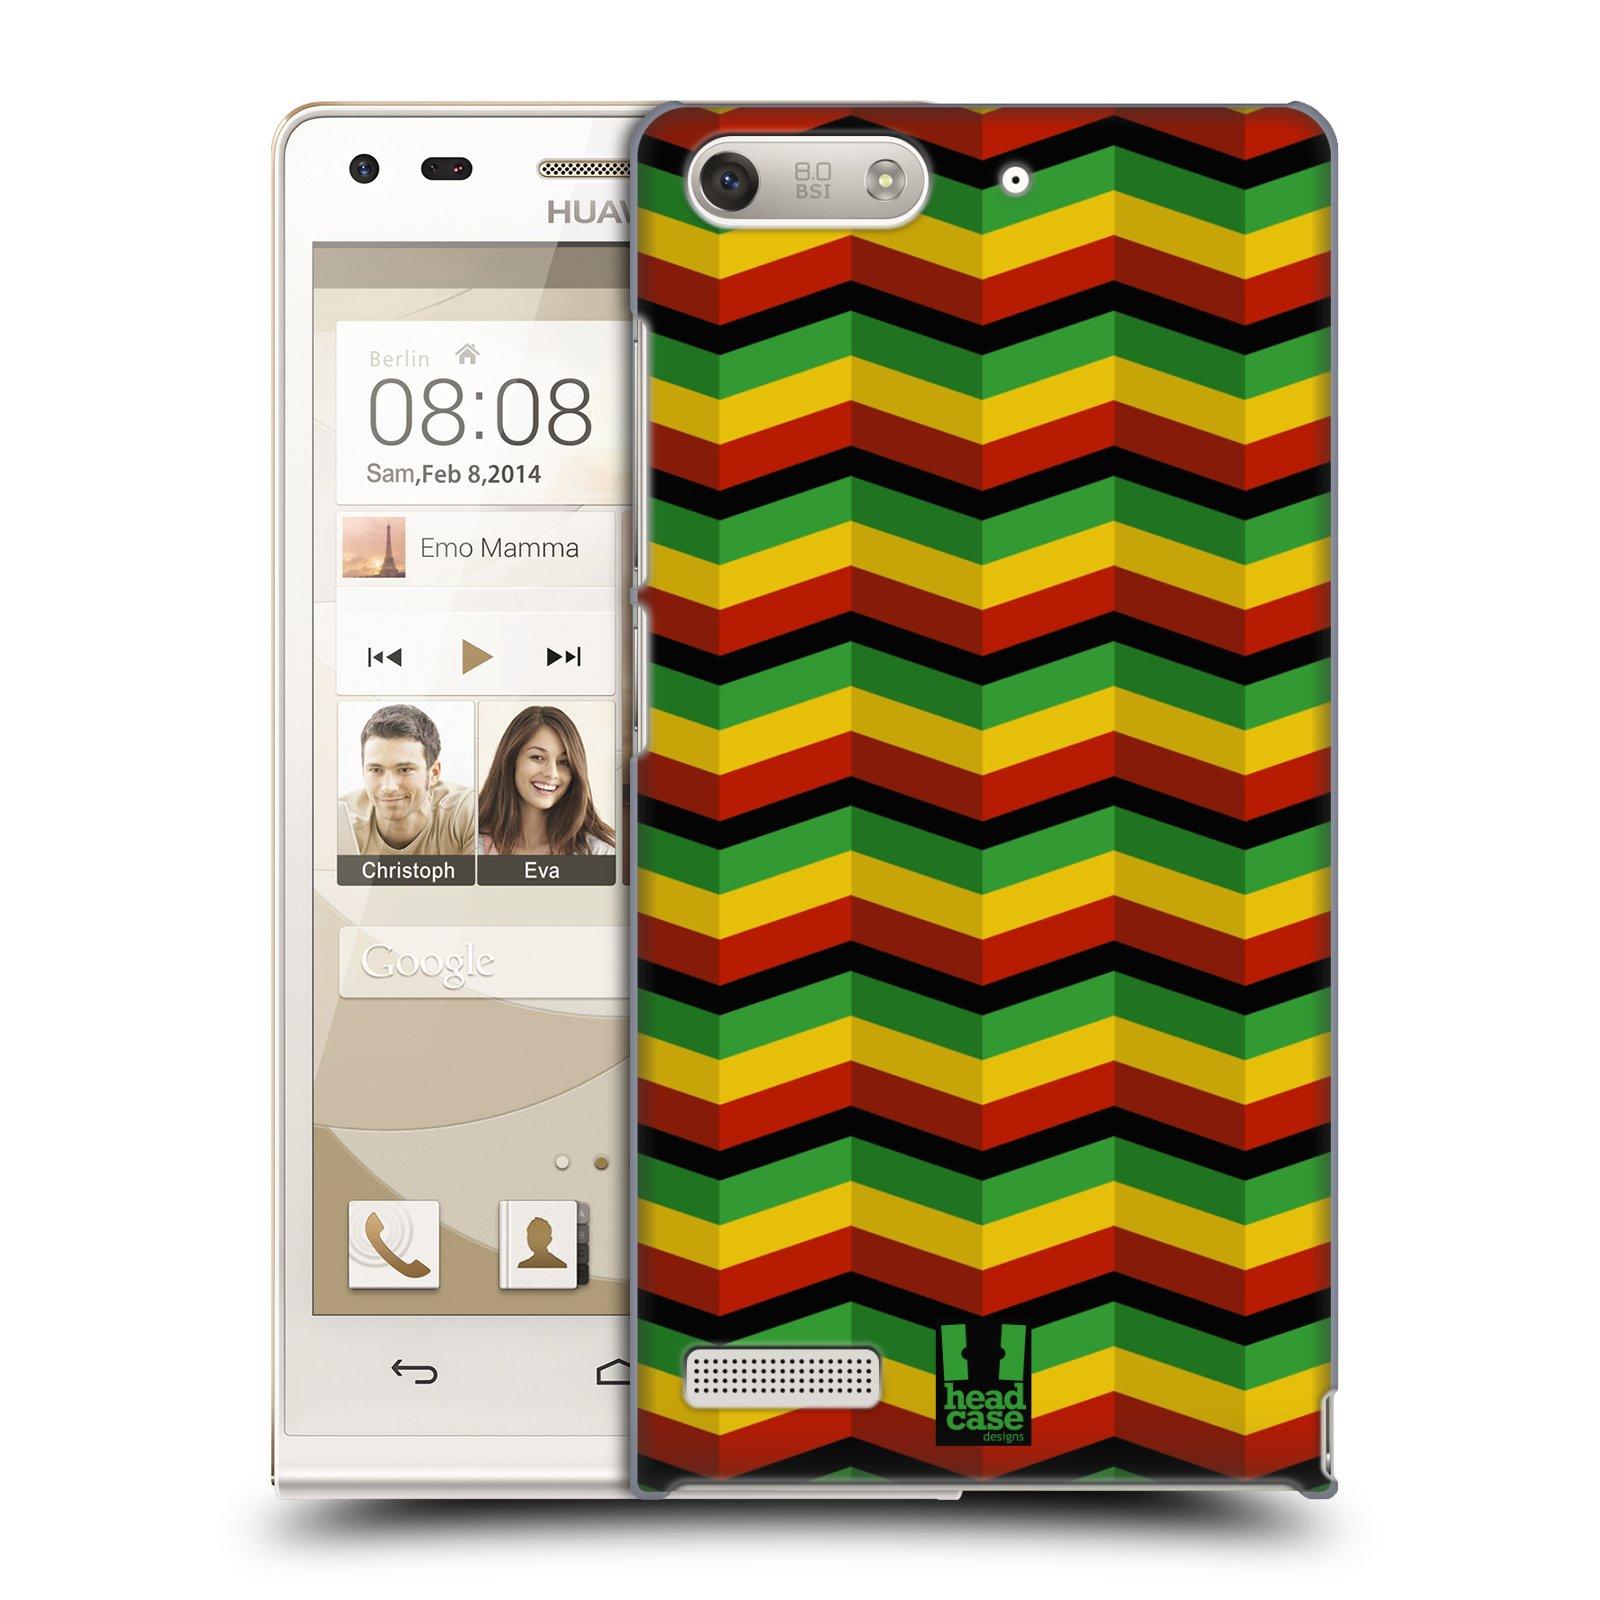 Plastové pouzdro na mobil Huawei Ascend G6 HEAD CASE RASTA CHEVRON (Kryt či obal na mobilní telefon Huawei Ascend G6 bez LTE)